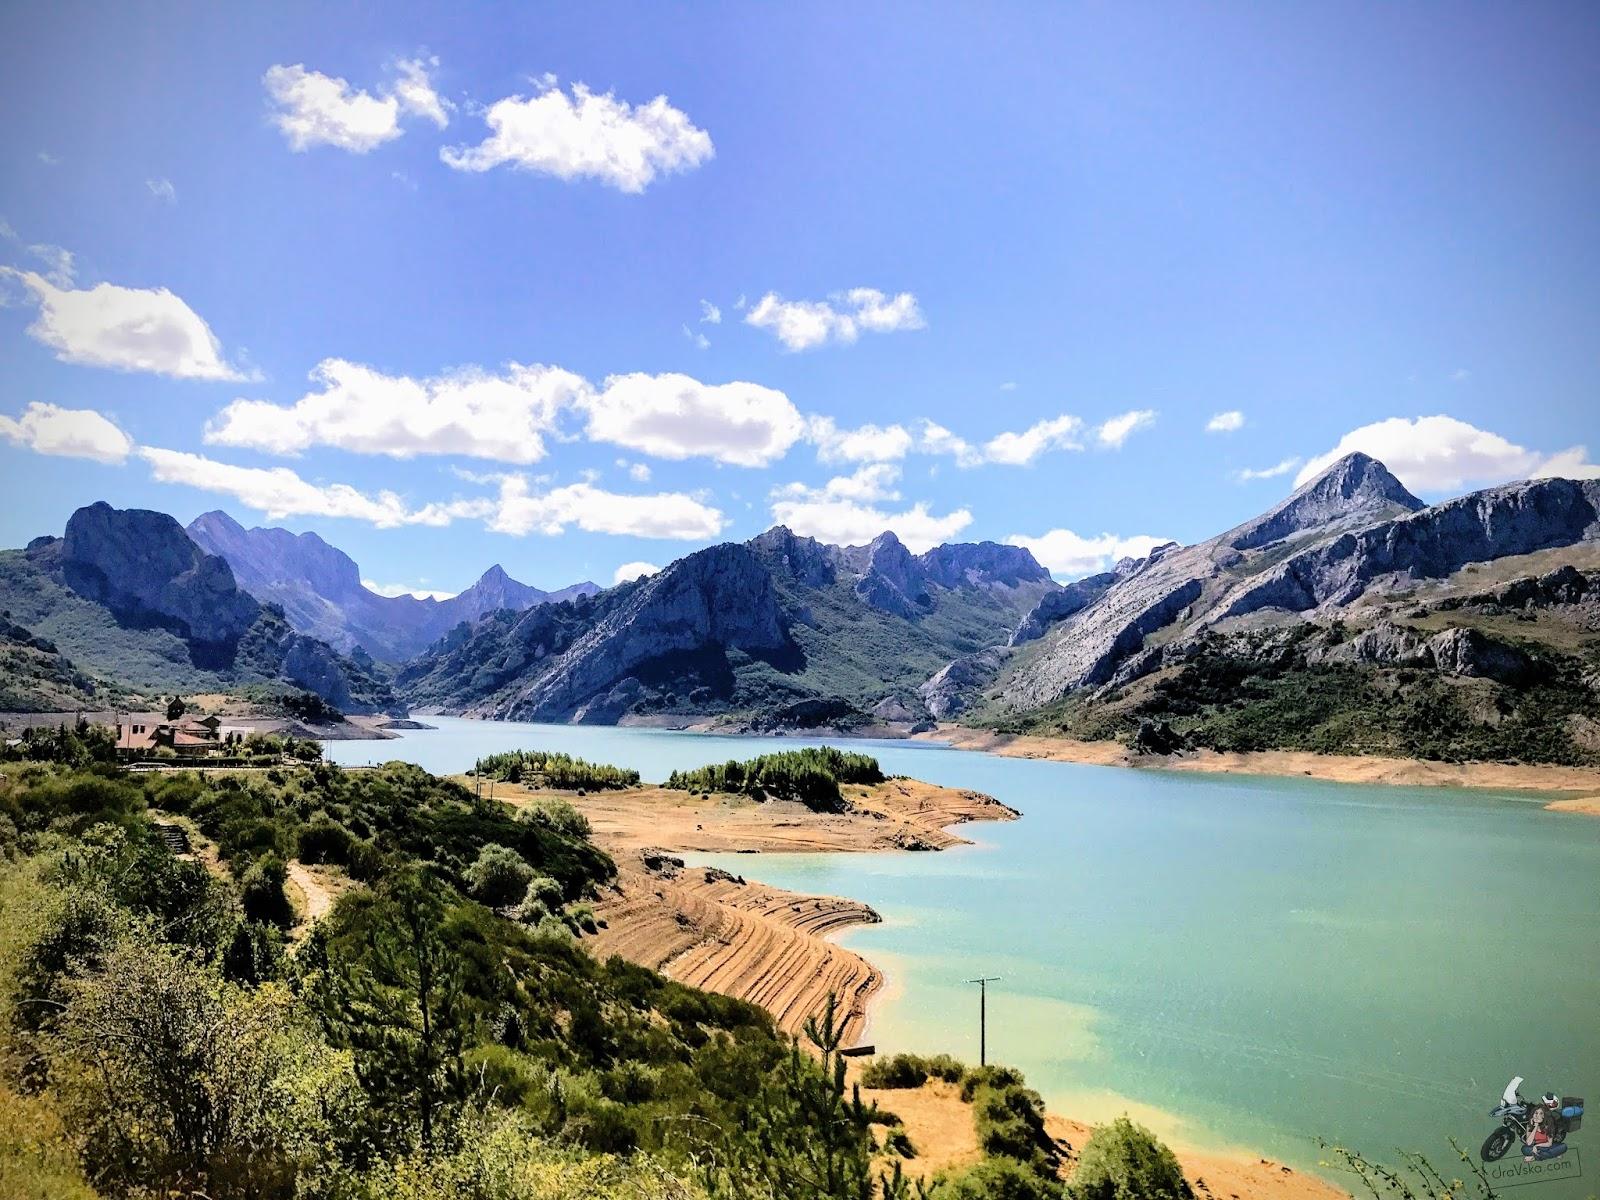 Hiszpański Park Narodowy Los Picos de Europa - MOTO Euro Trip 2017 dzień 11 part 2